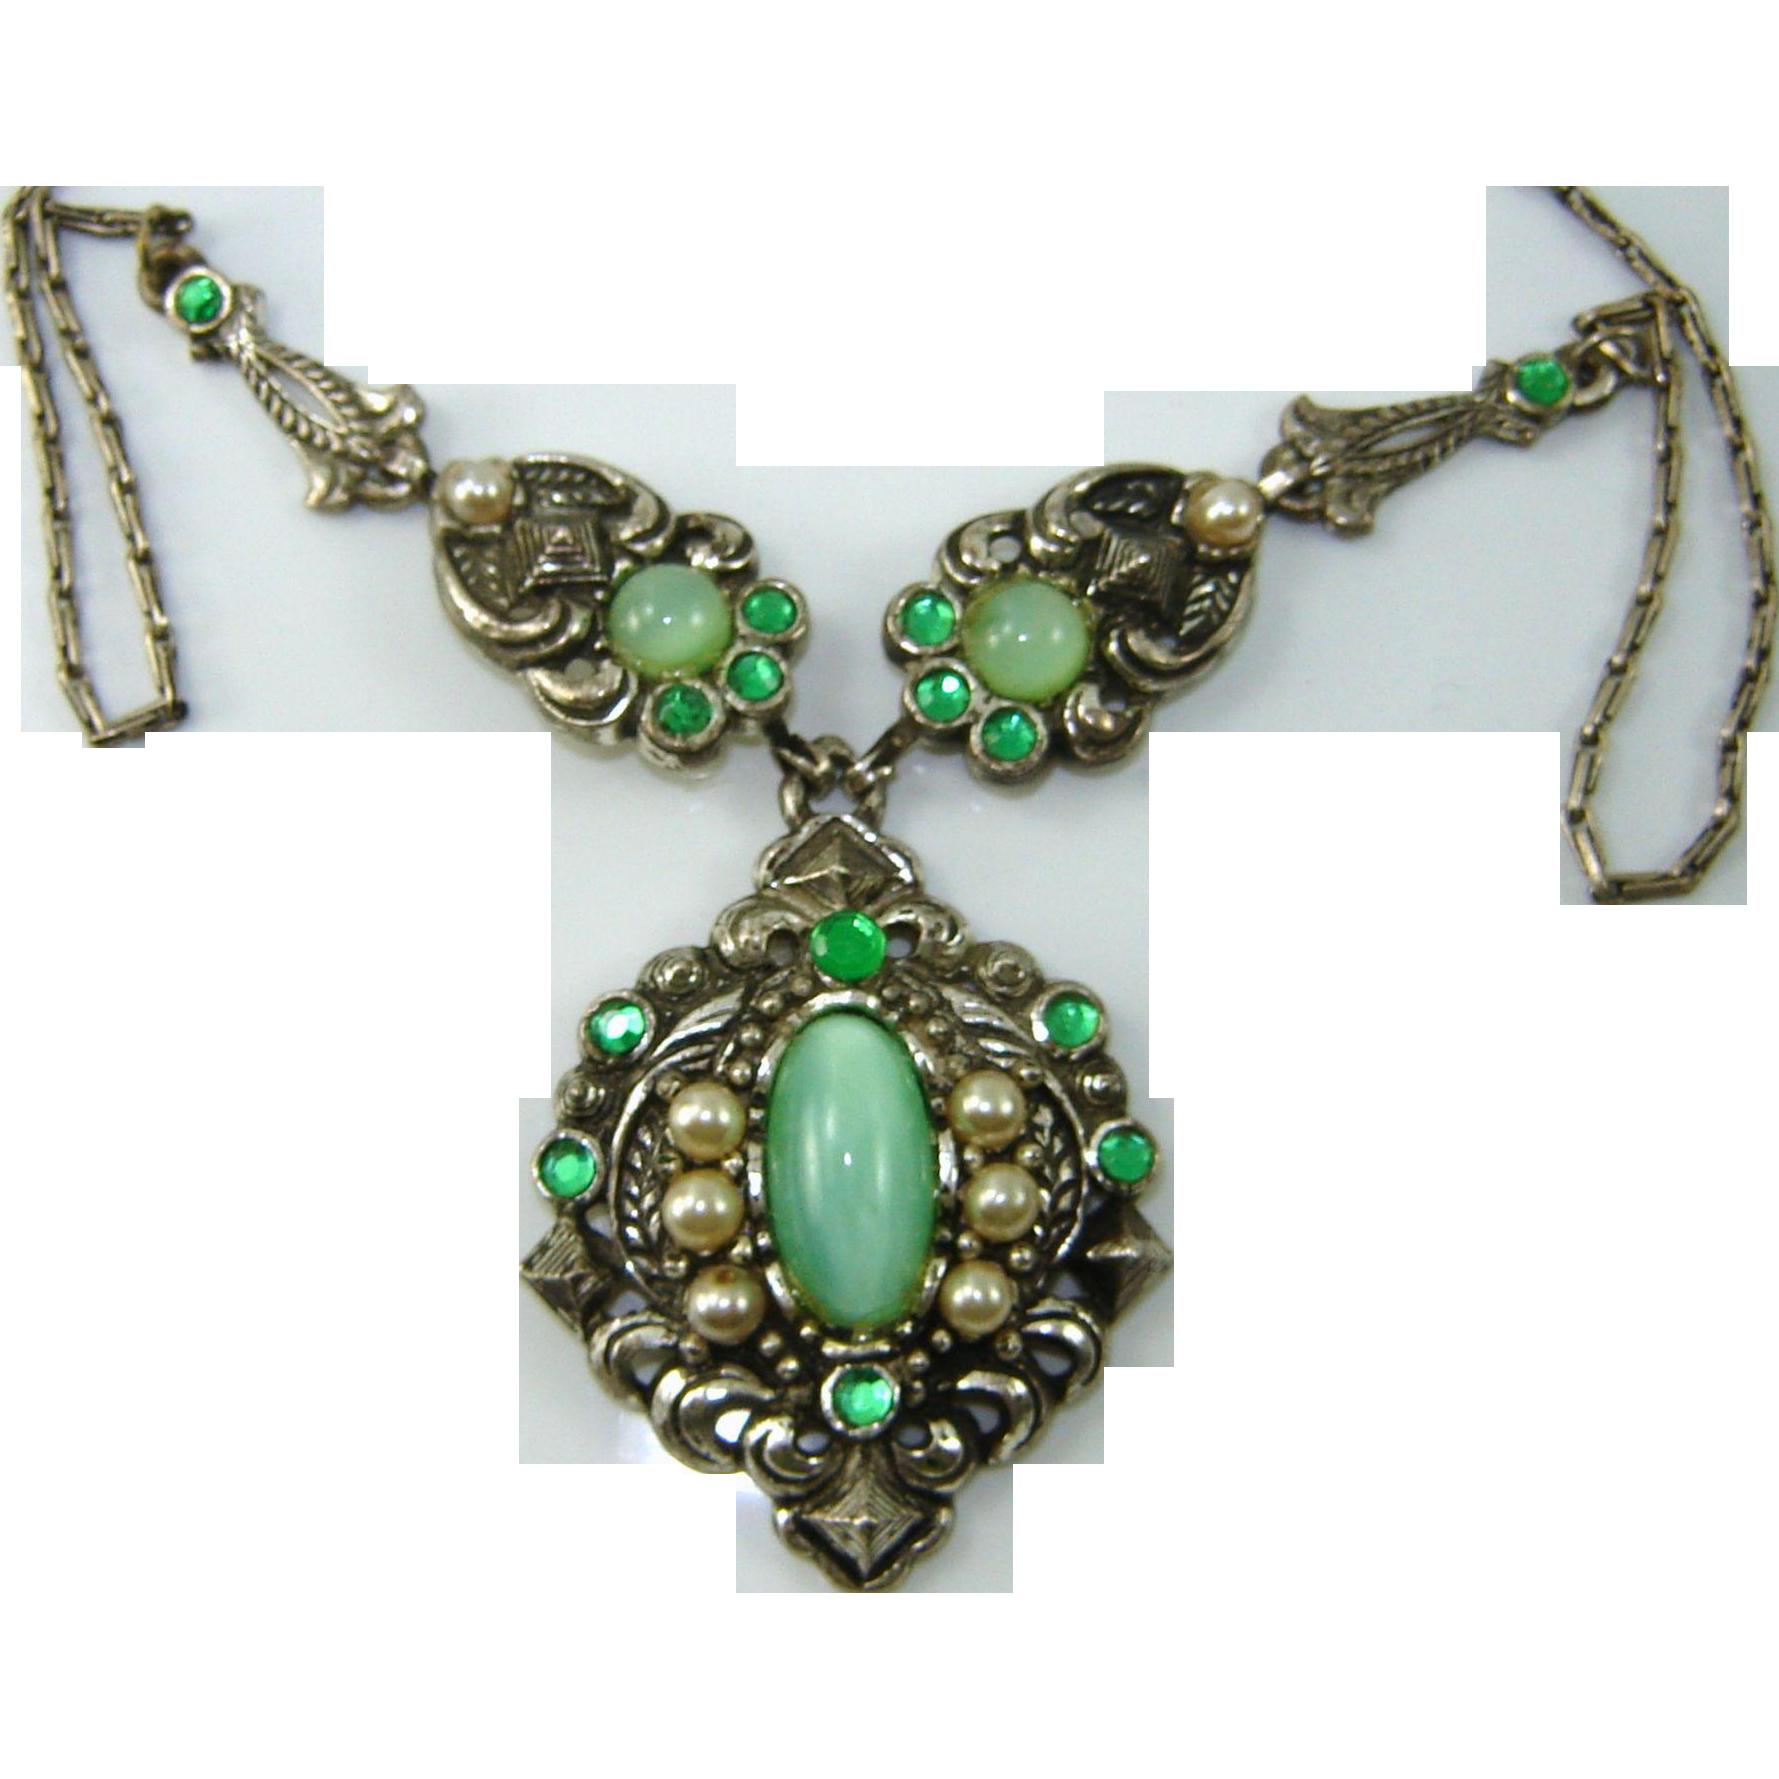 Vintage Necklace VICTORIAN REVIVAL Green Satin Moonstone Rhinestone